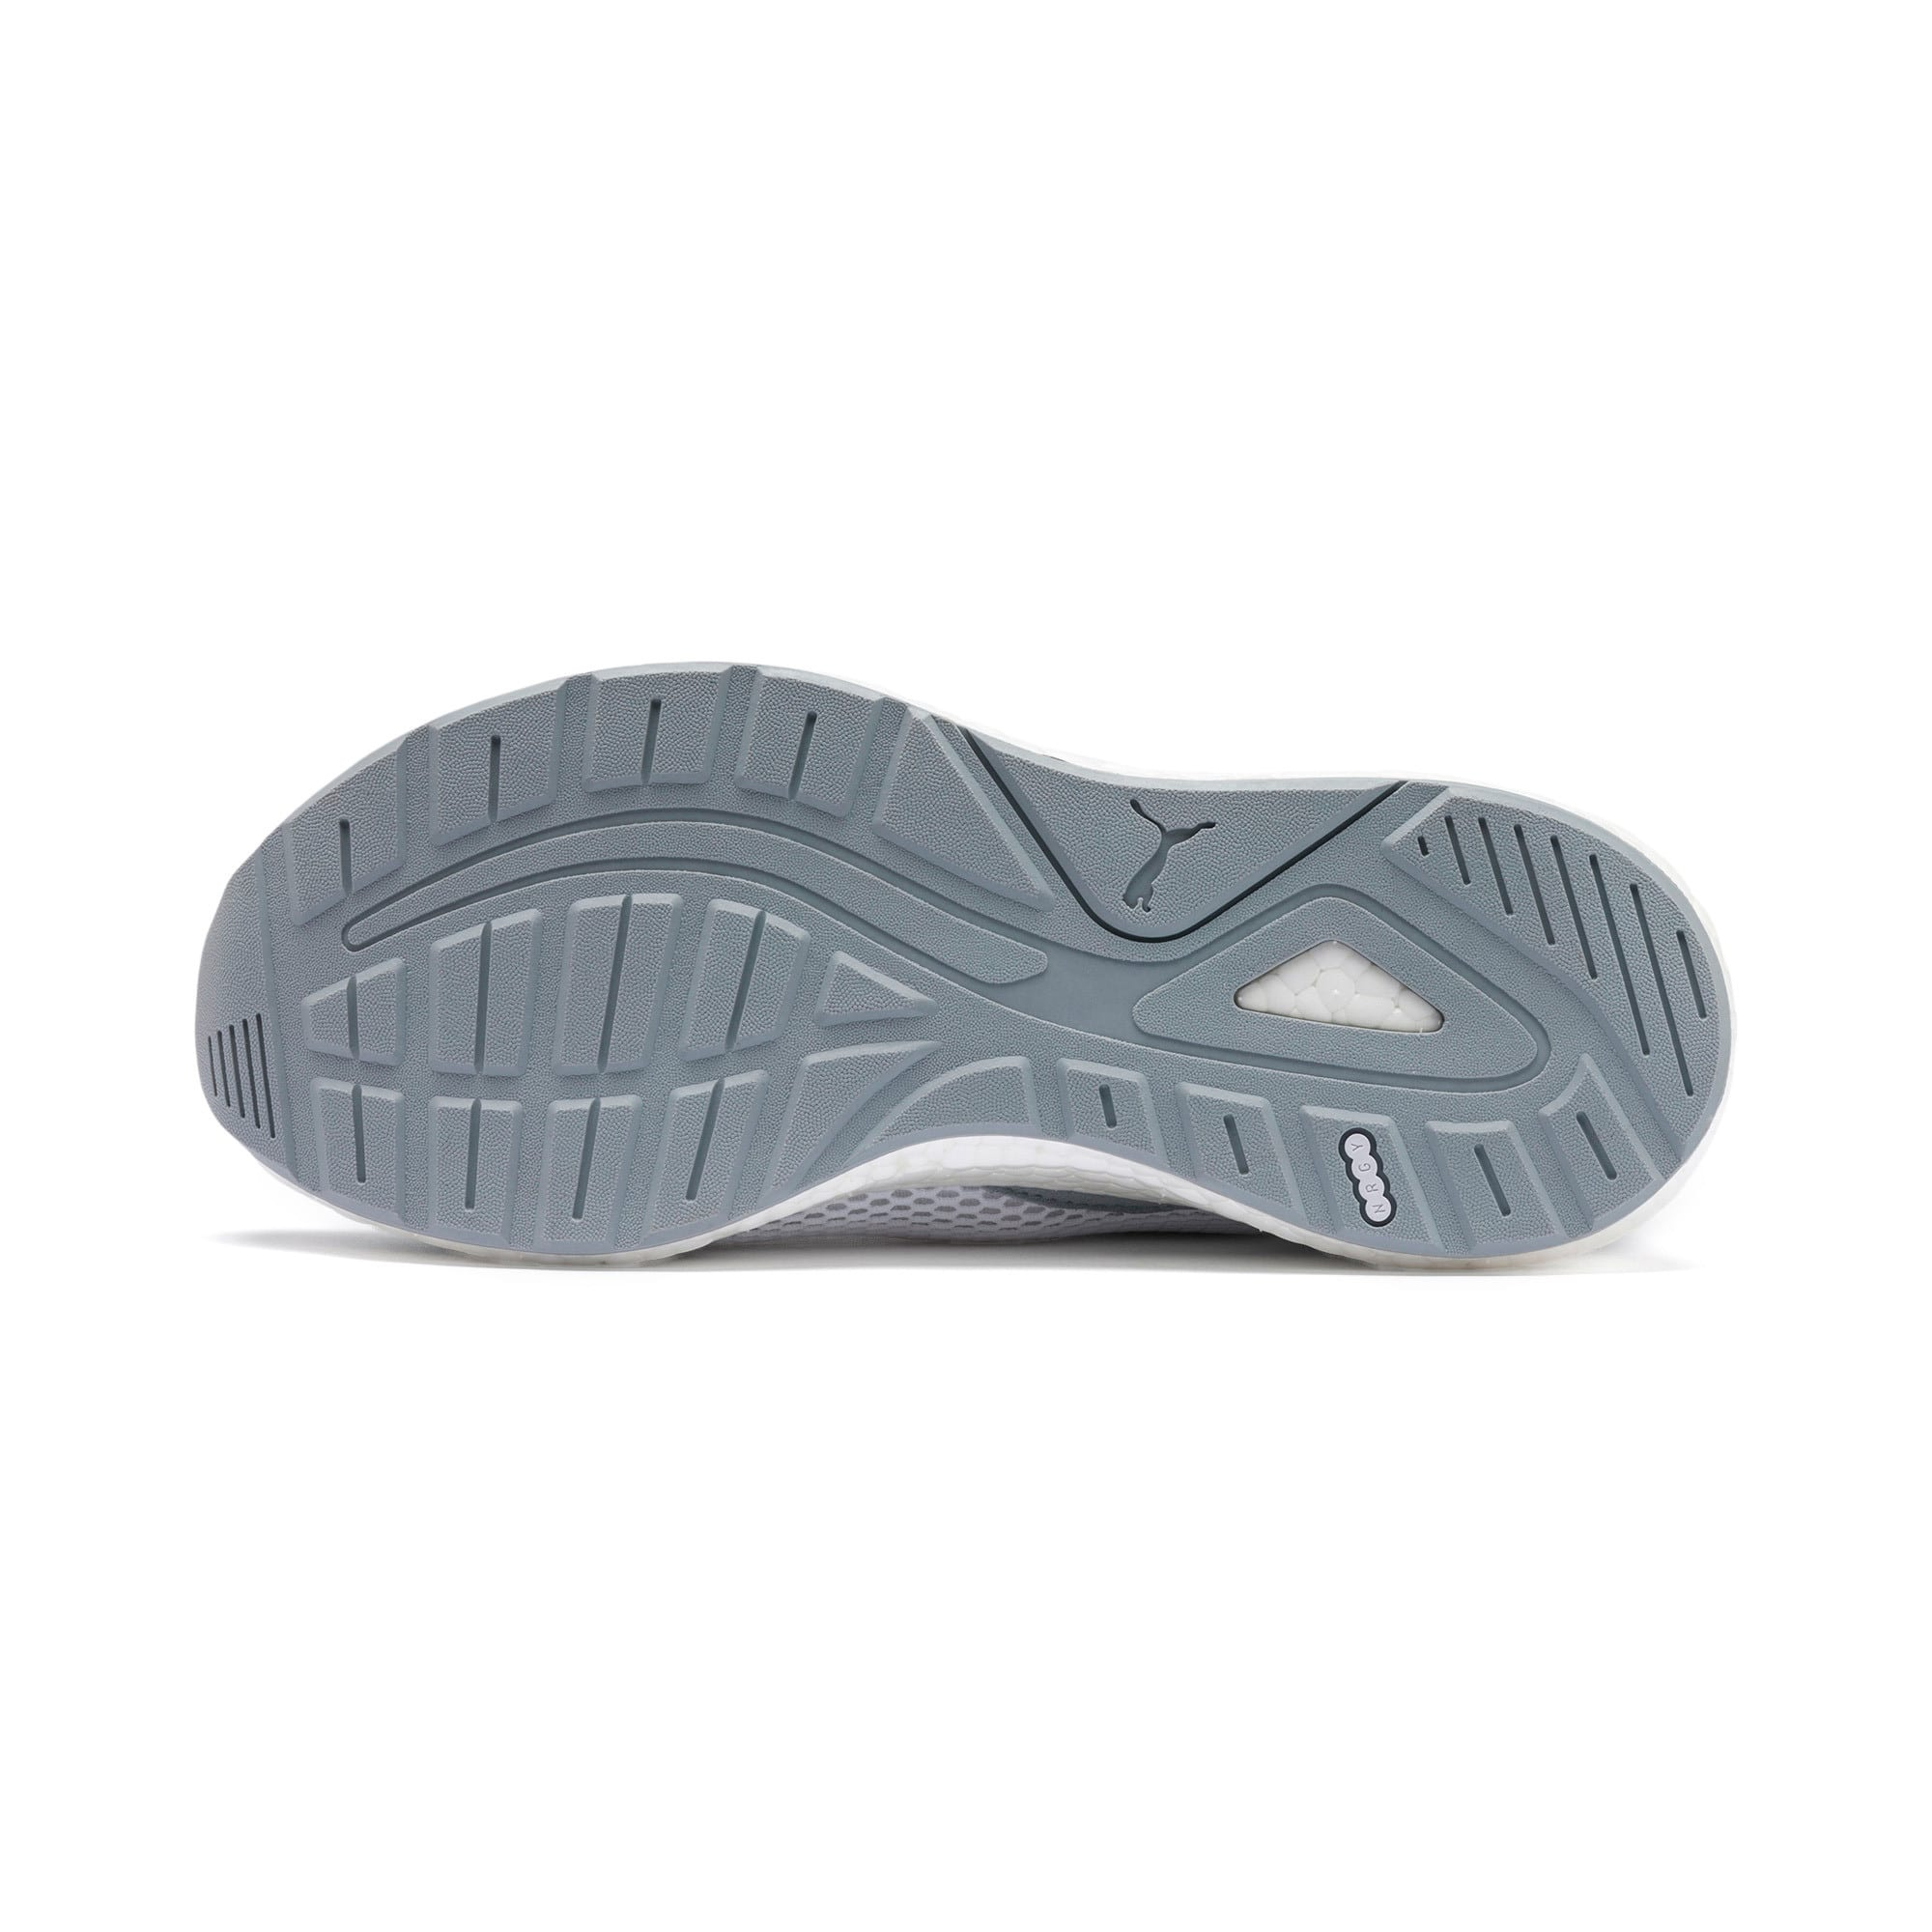 Thumbnail 5 of NRGY Neko Skim Women's Running Shoes, Puma White-Quarry, medium